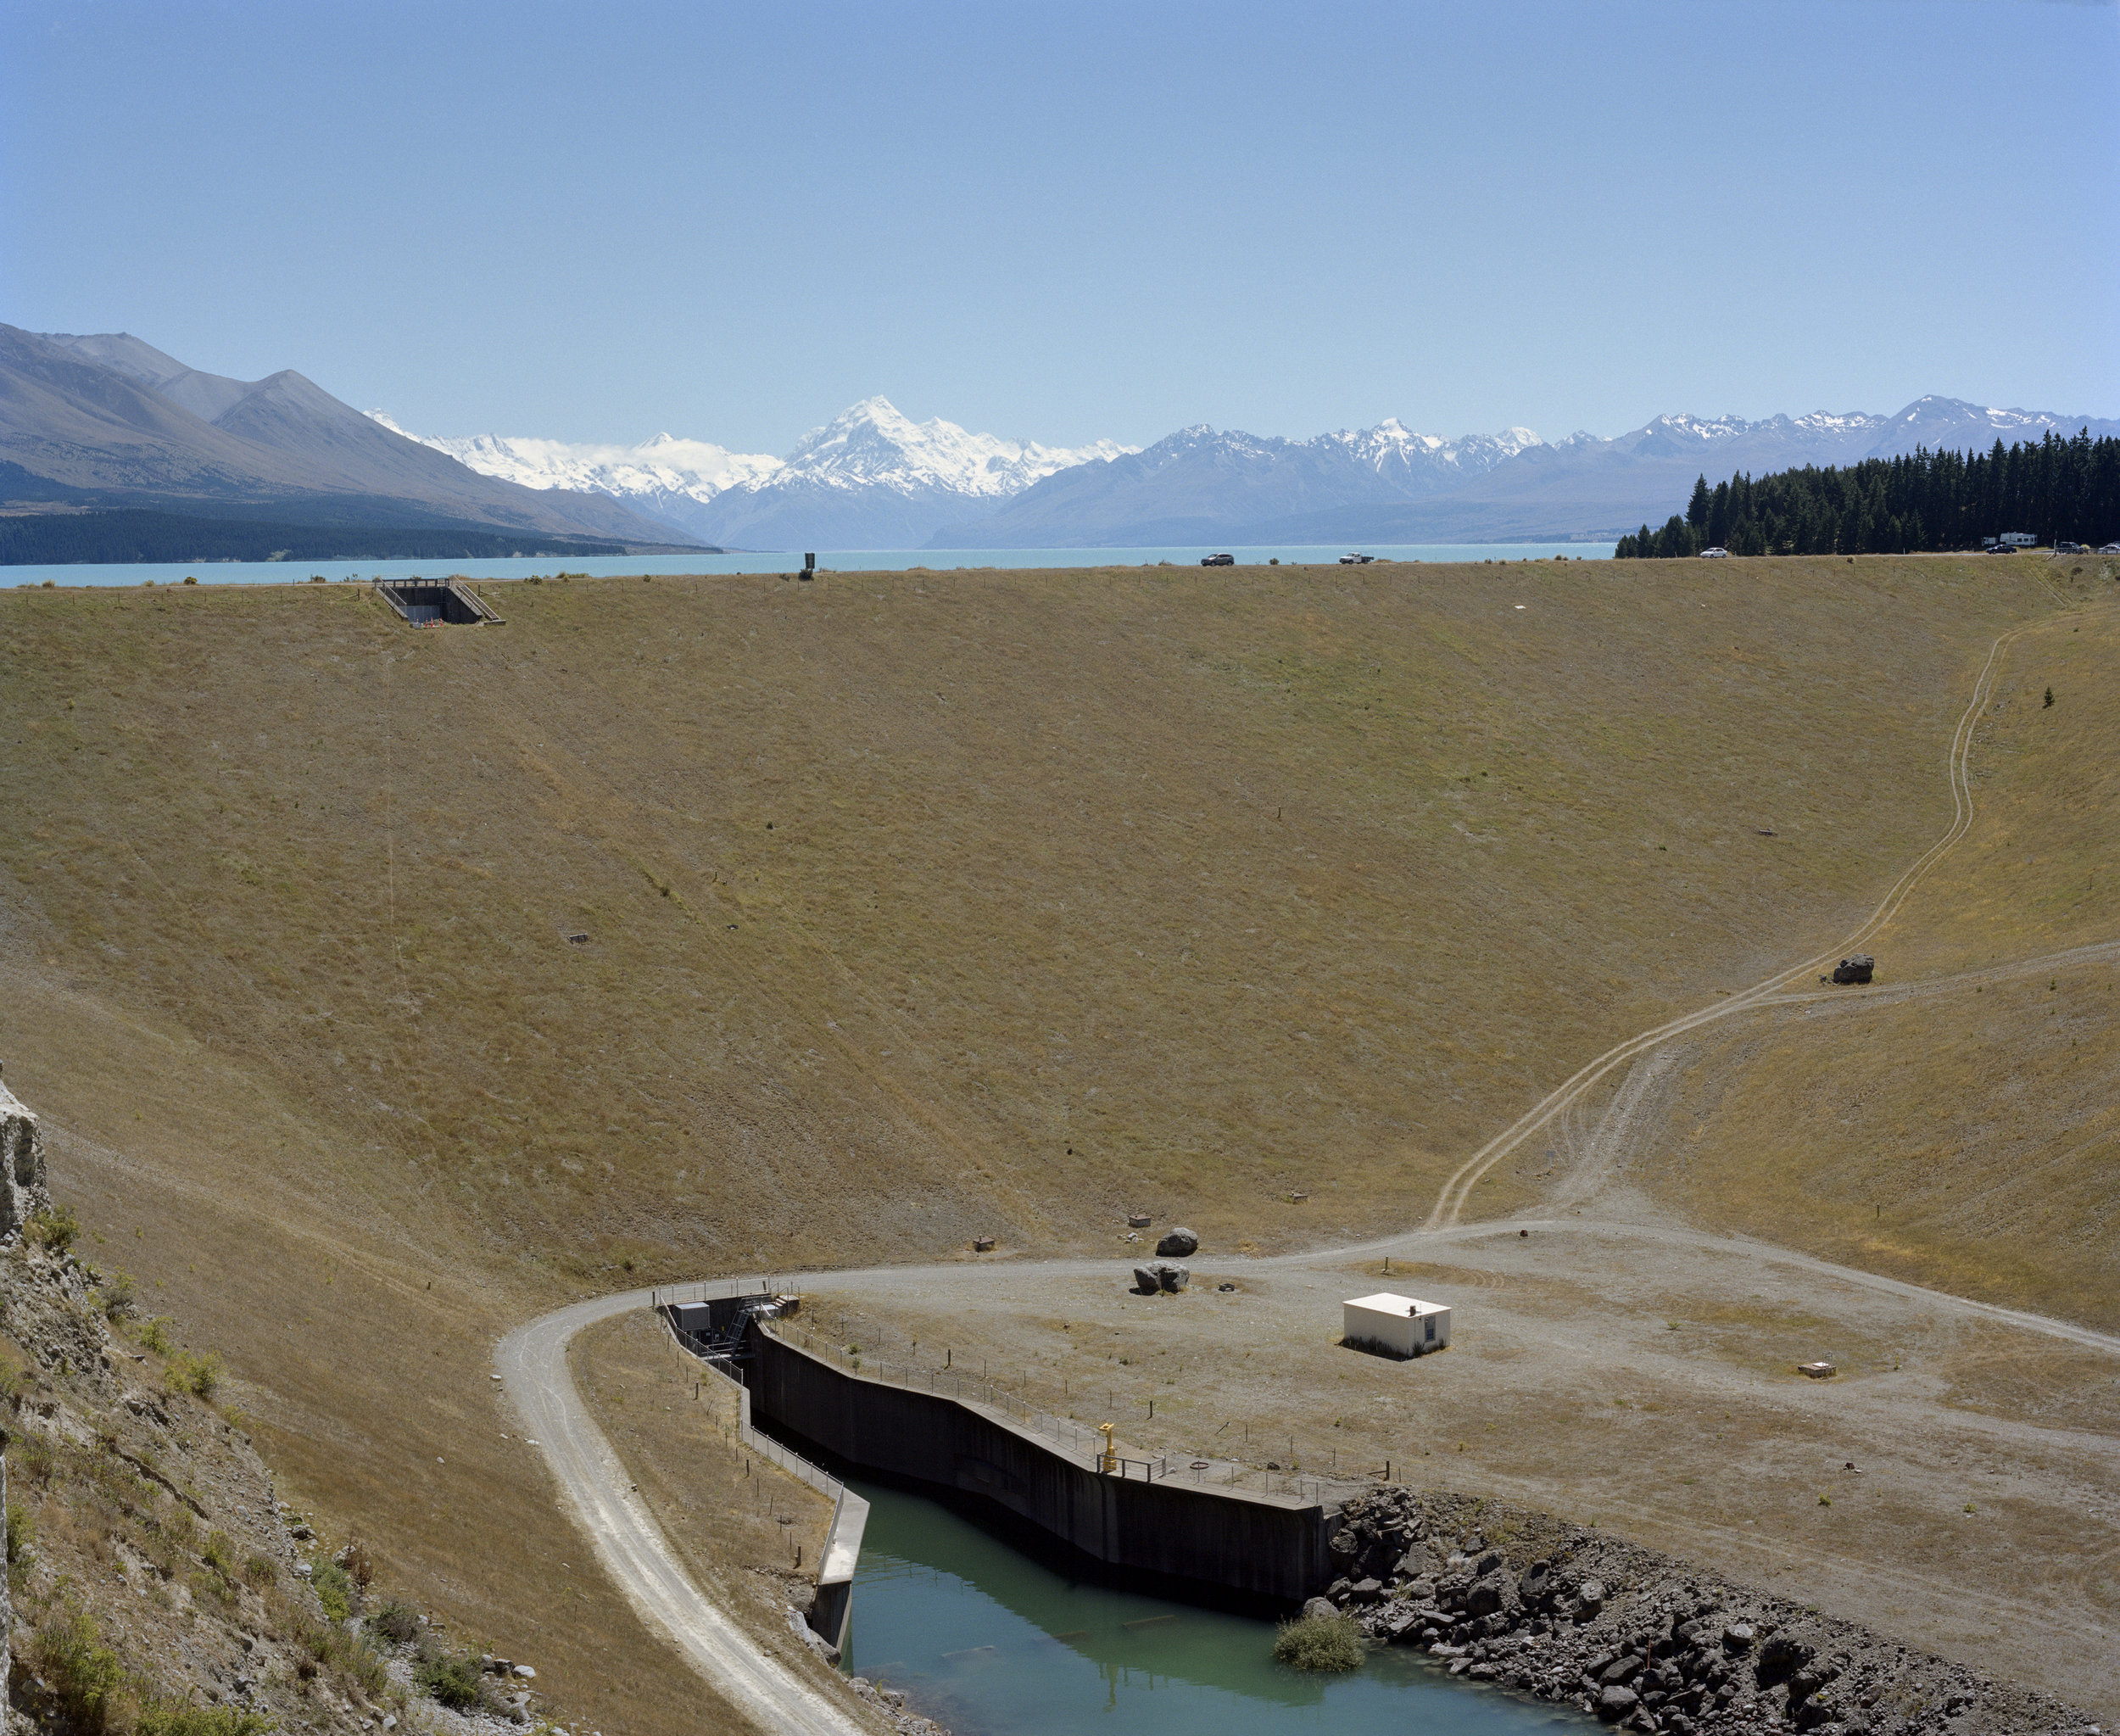 Waitaki Hydroelectric Scheme, Mackenzie Basin, 2013